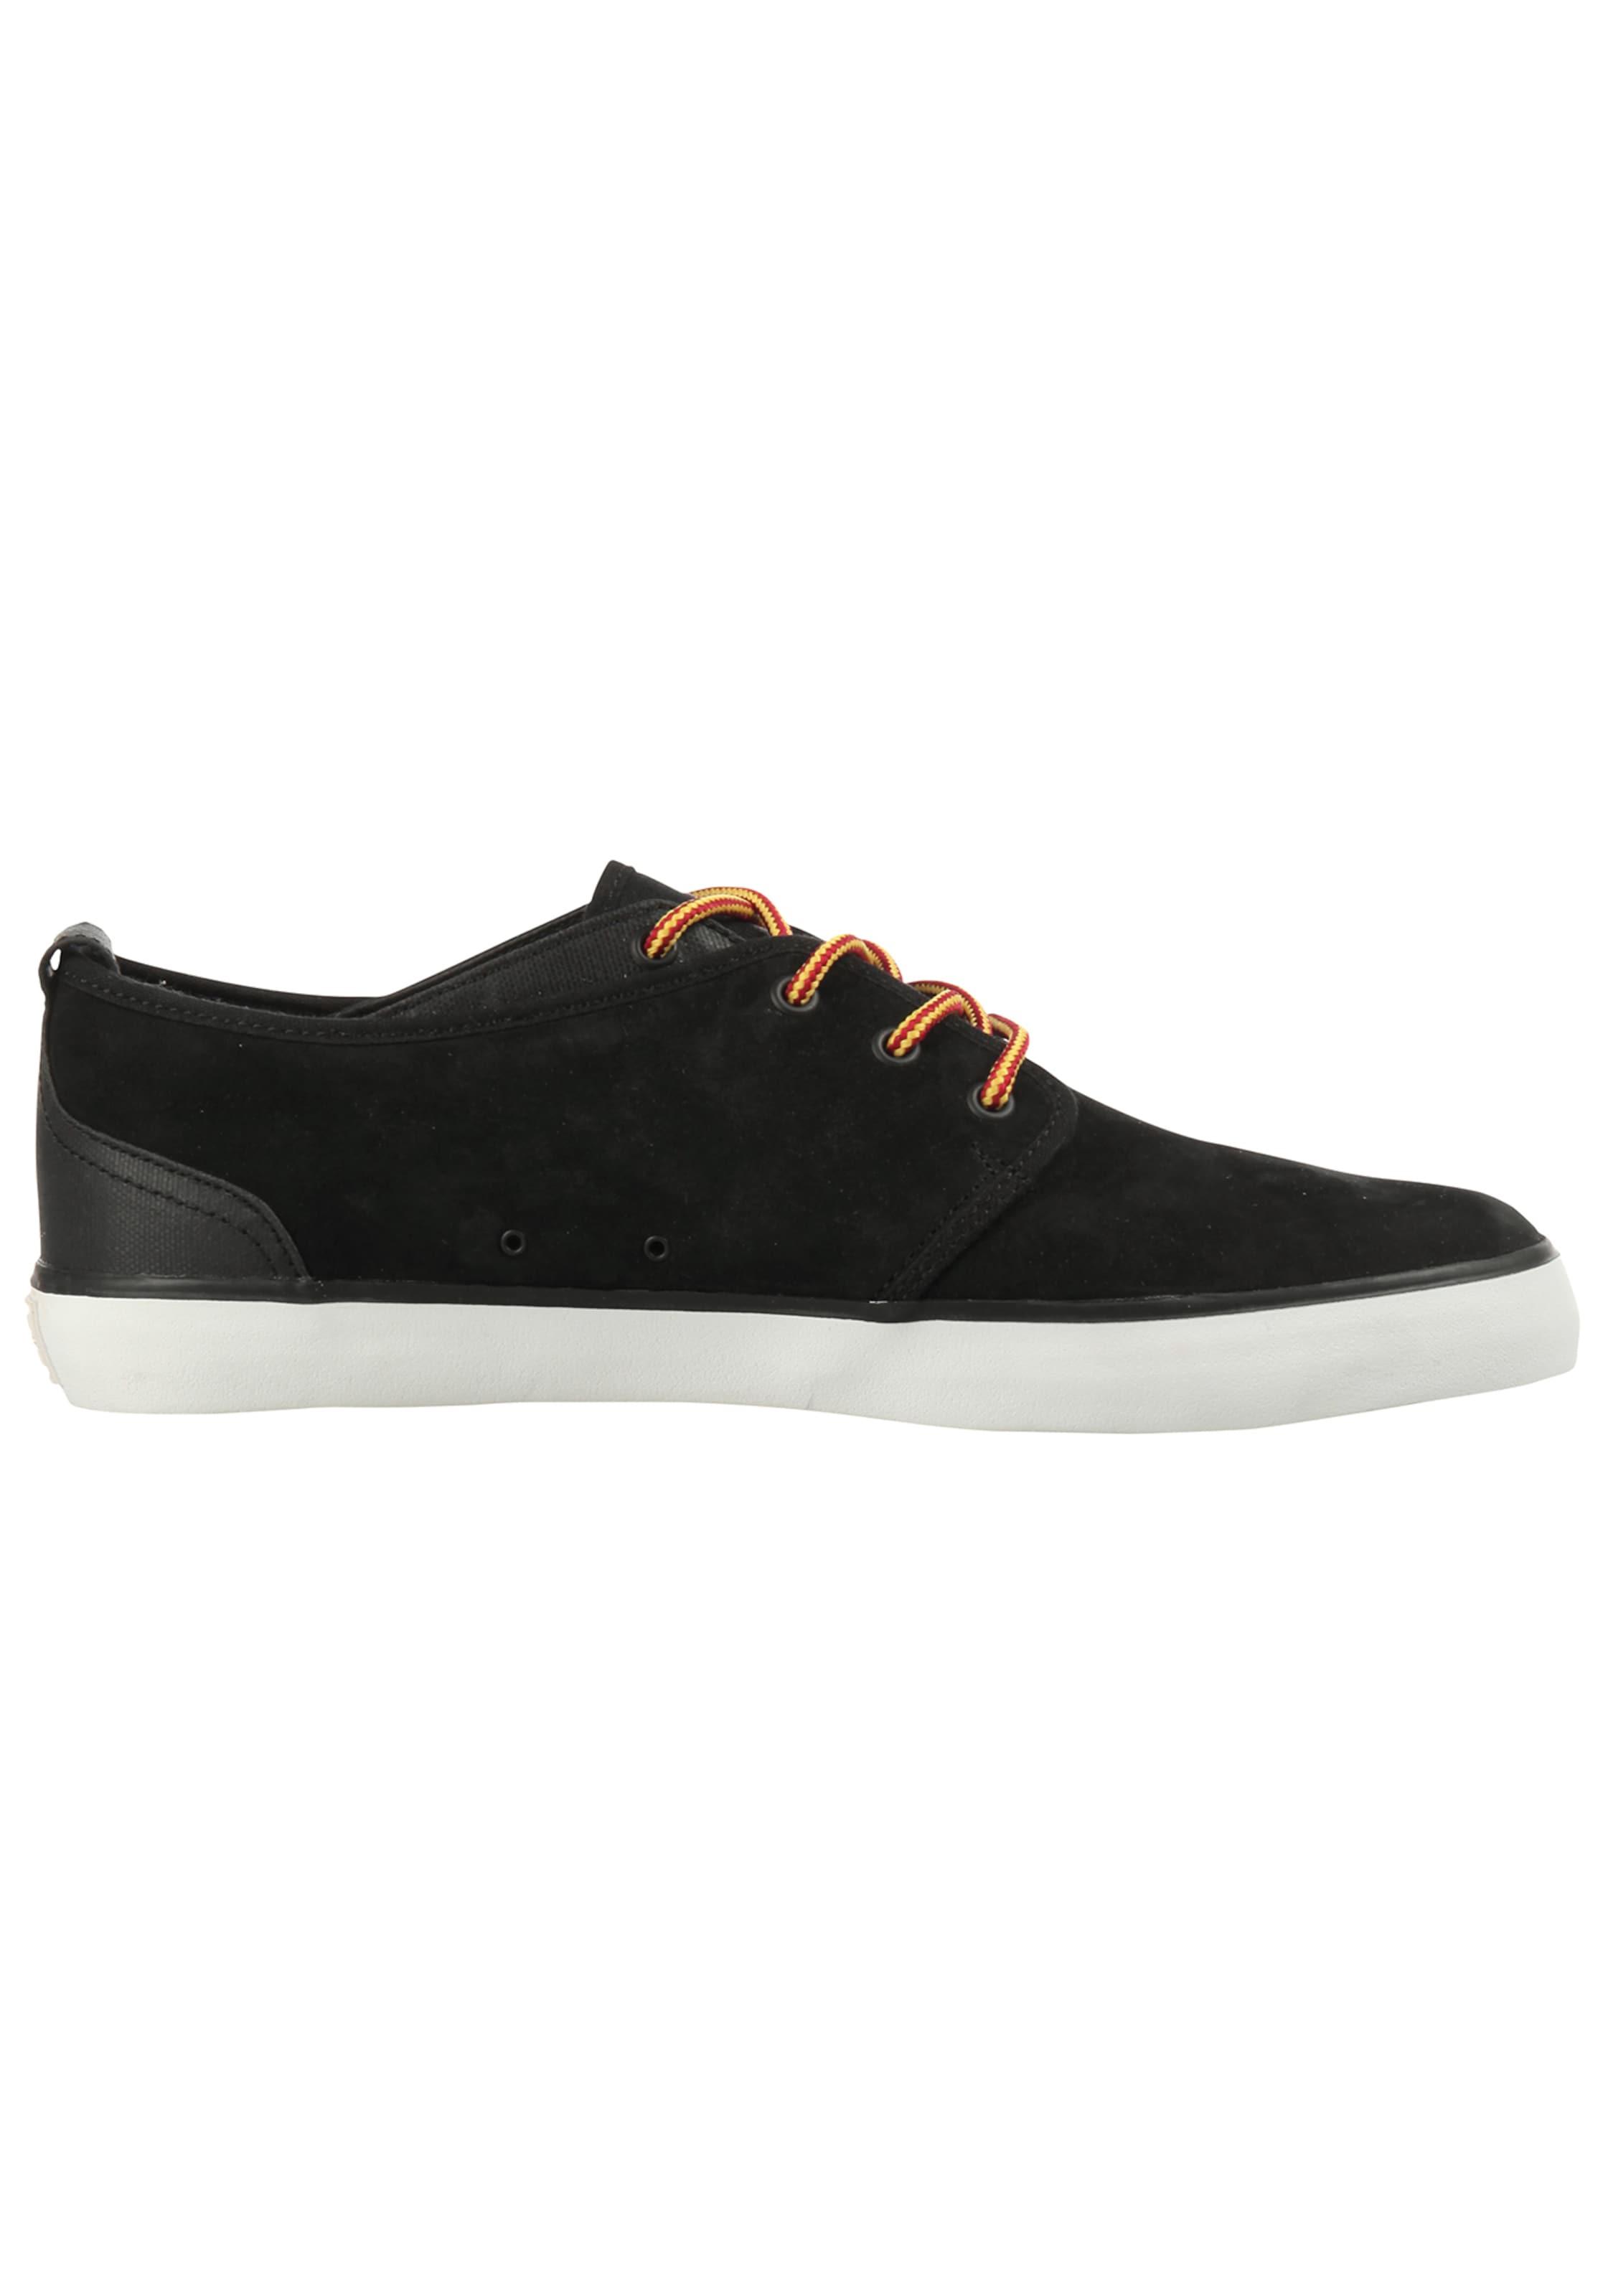 'studio Dc In Sneaker 2 Schwarz Le' Shoes 5Rjq4LcA3